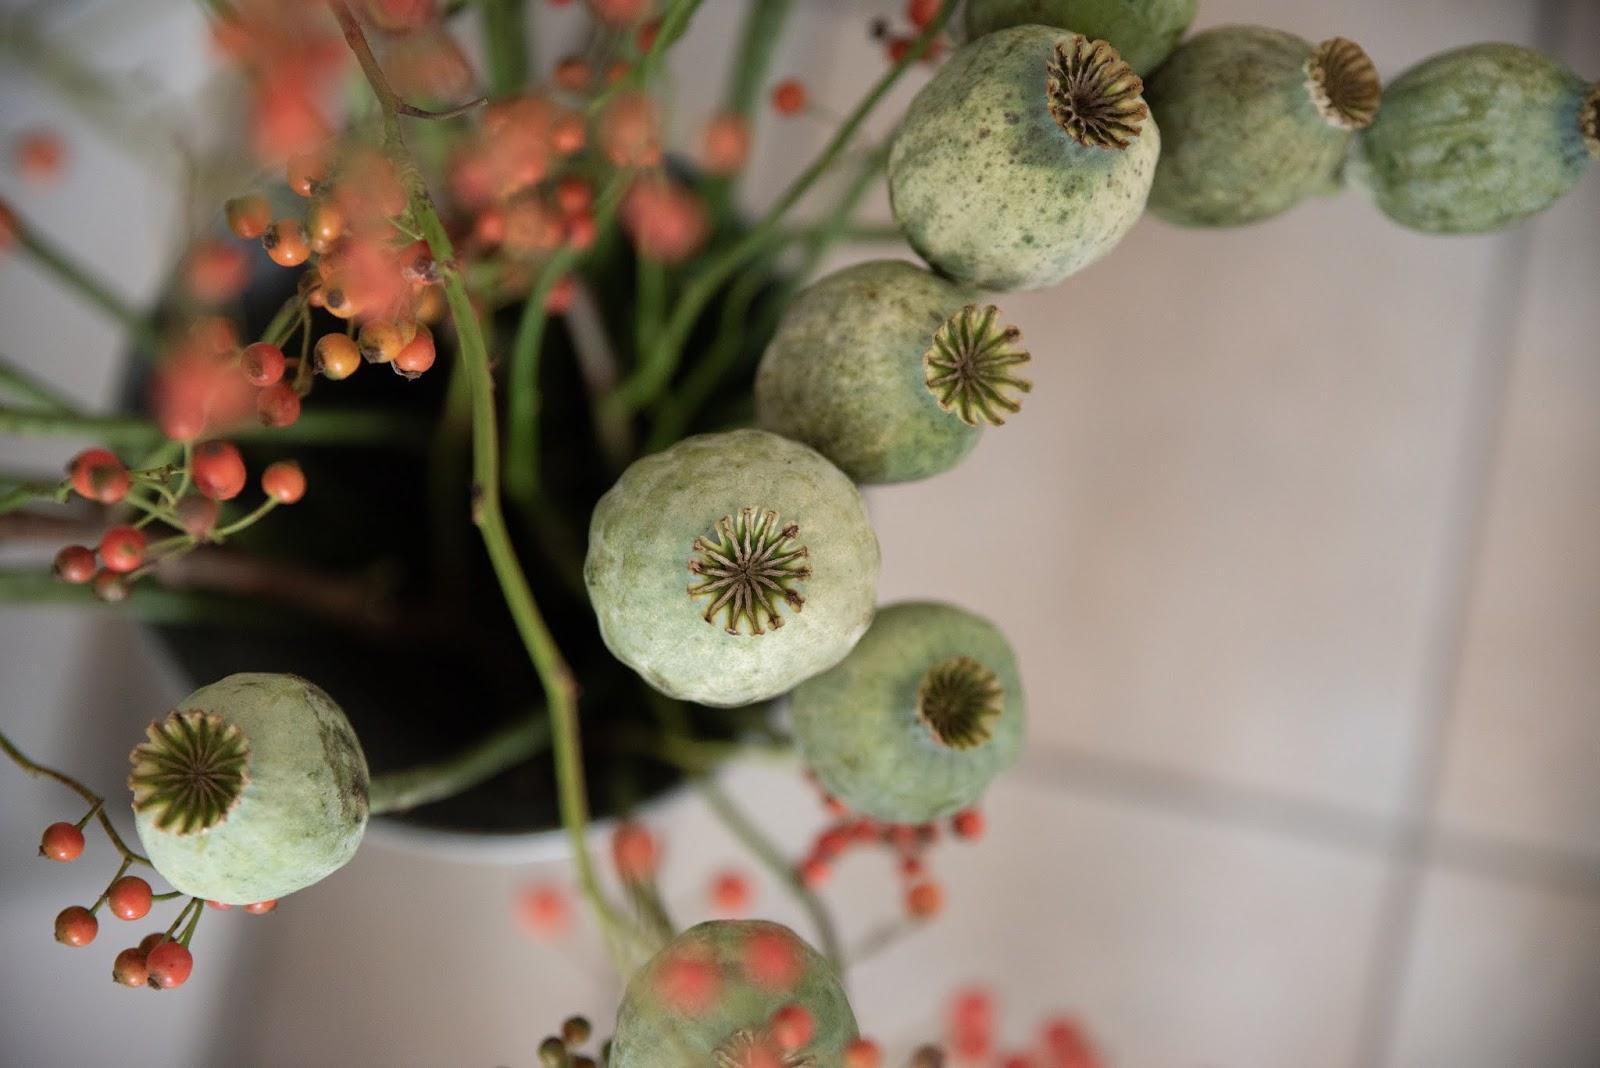 Herbstdeko mit Mohnkapseln Hagebutten Deko mit Naturmaterialien